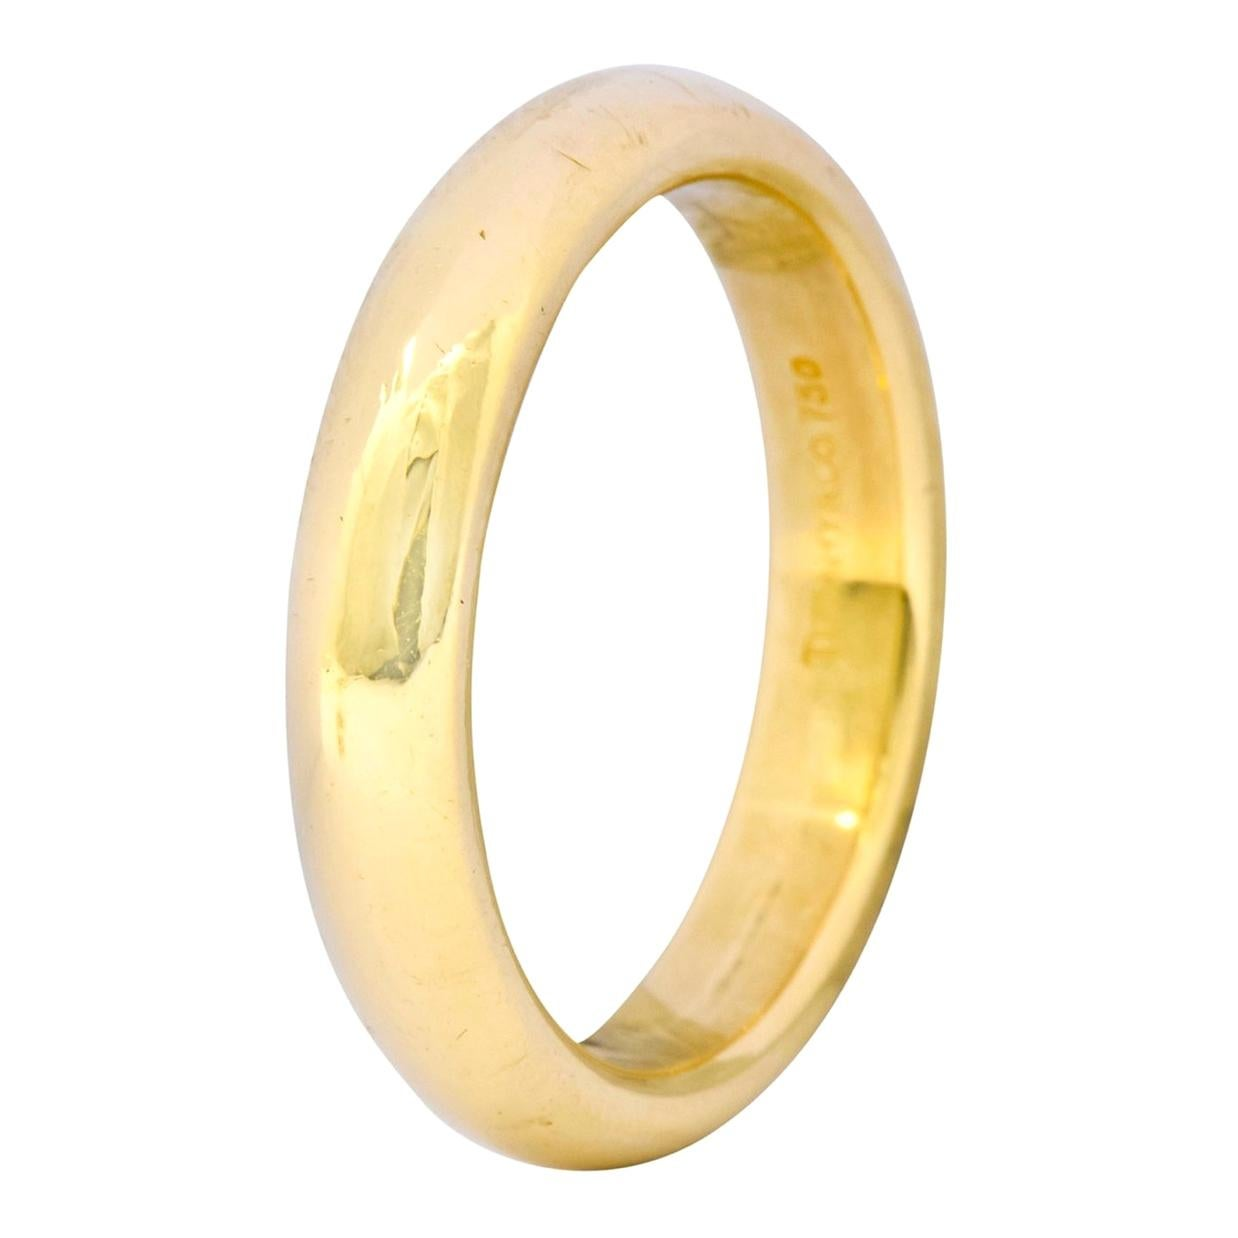 Tiffany & Co. Yellow Gold Plain Wedding Band Ring, Estate